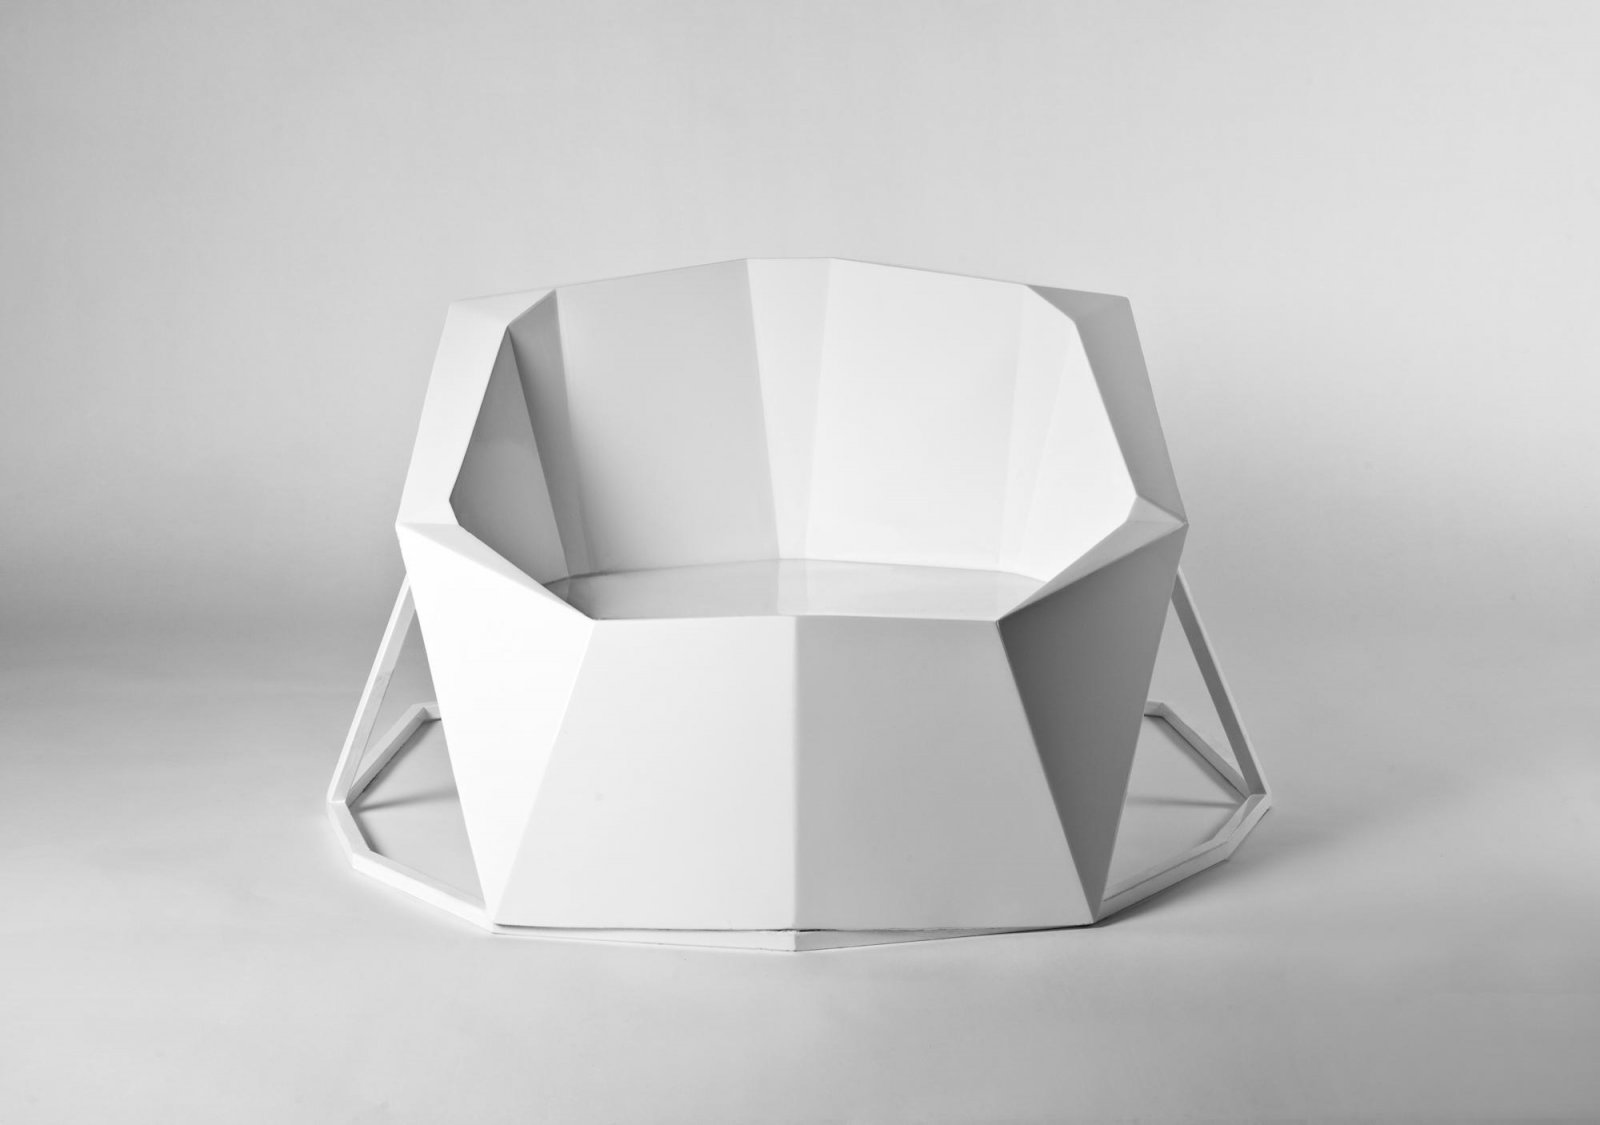 muebles de dise o innovadores mut design decoraci n del